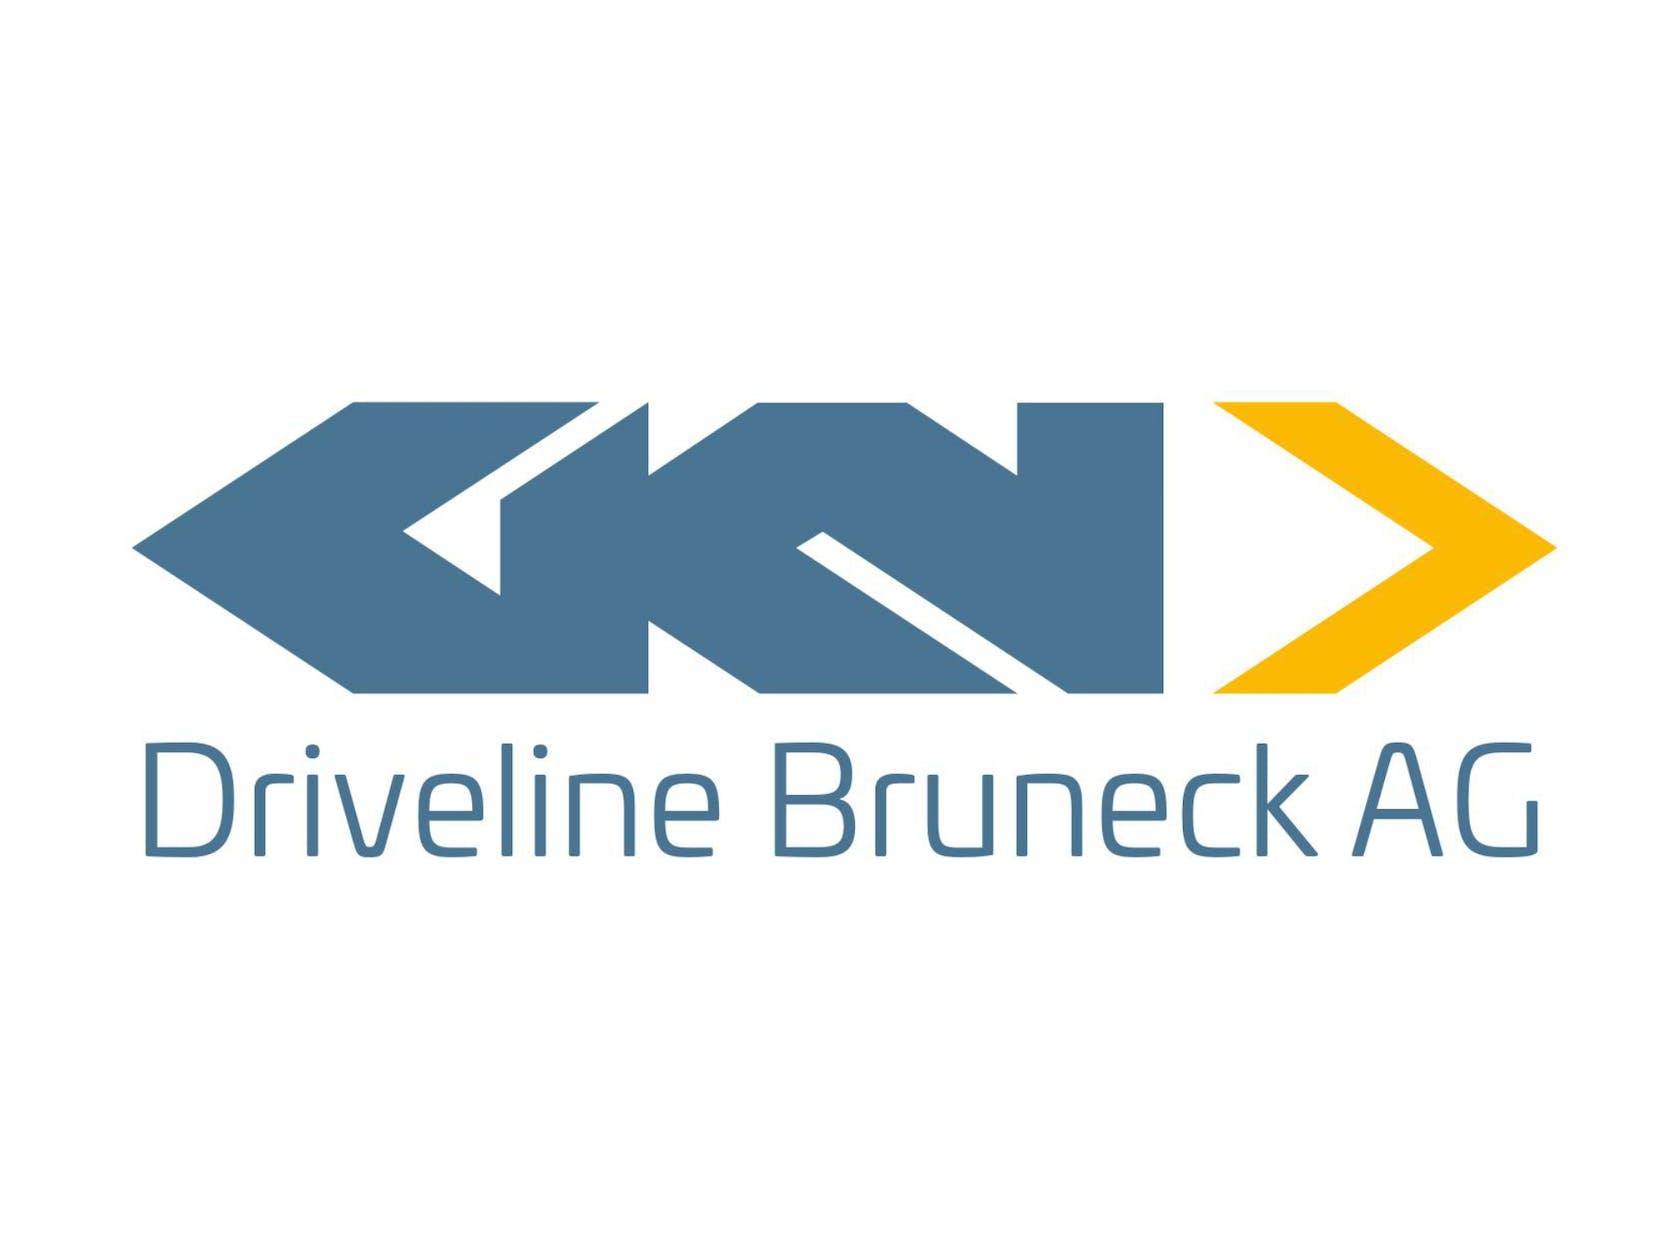 GKN Driveline Bruneck AG